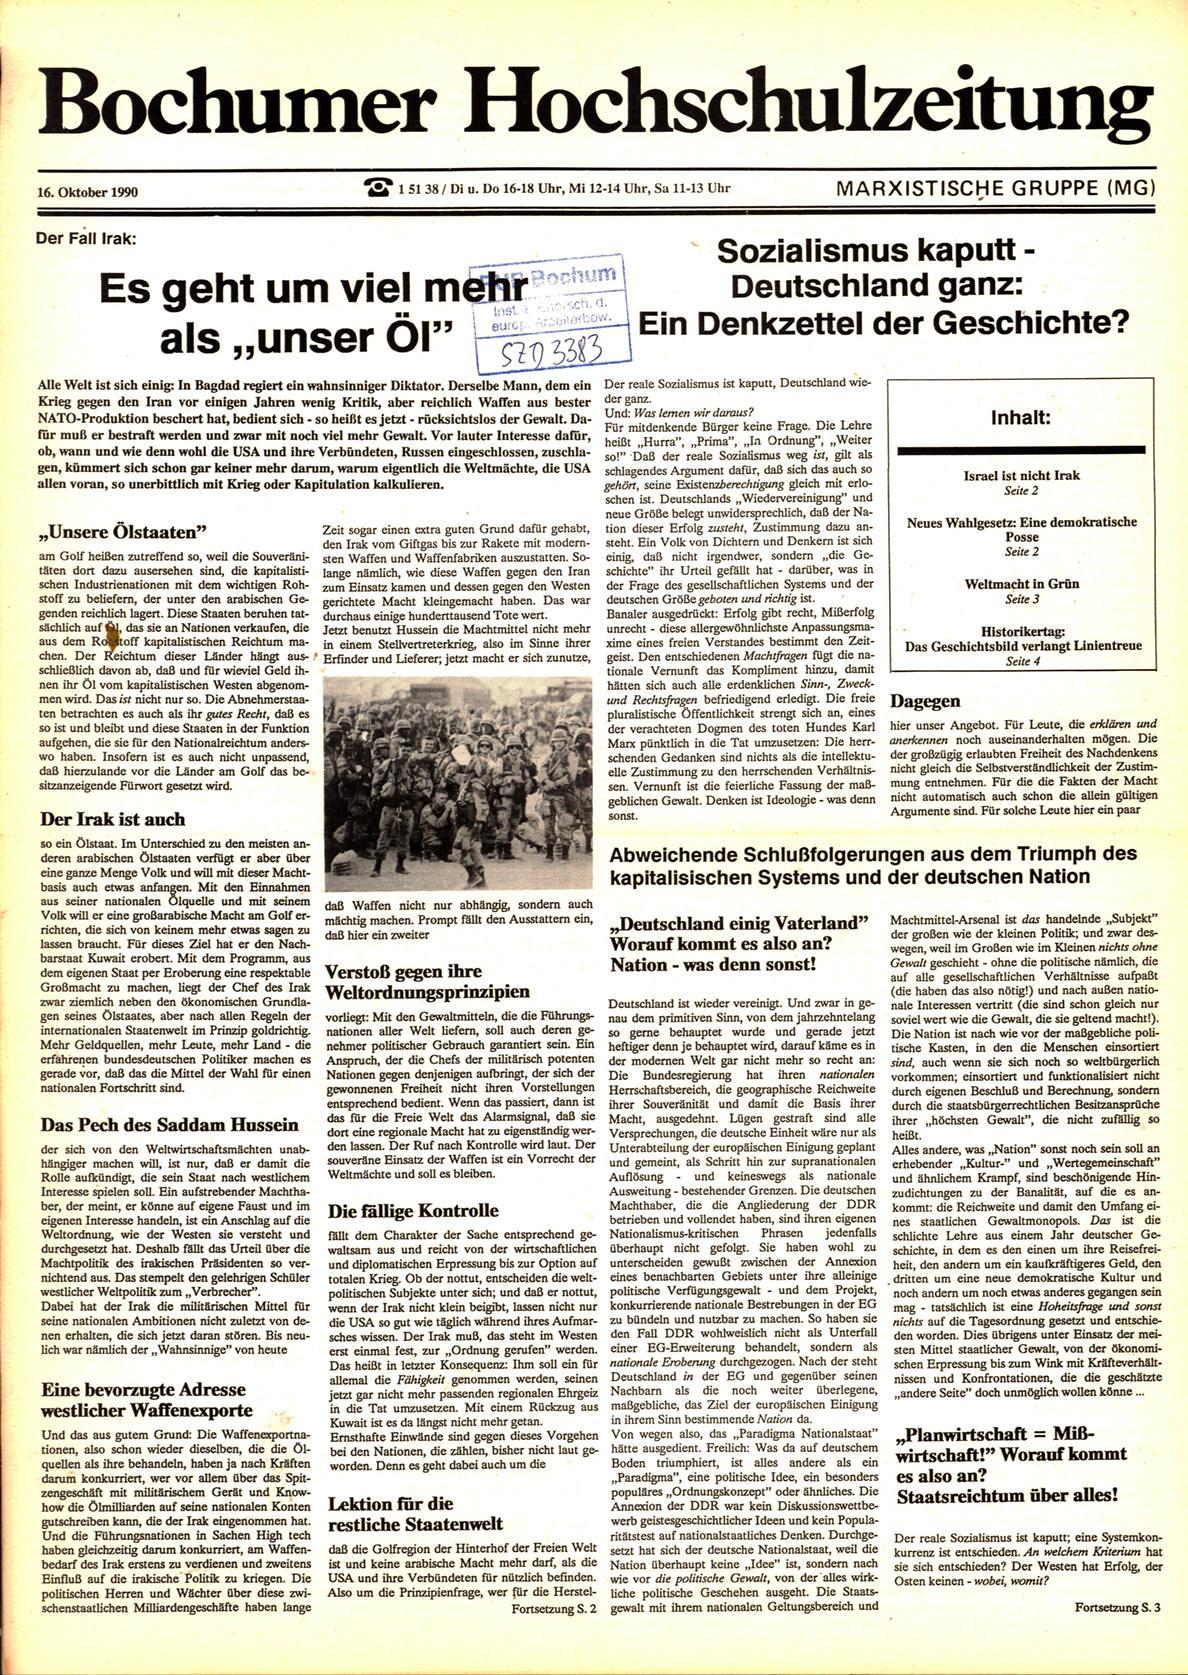 Bochum_BHZ_19901016_001